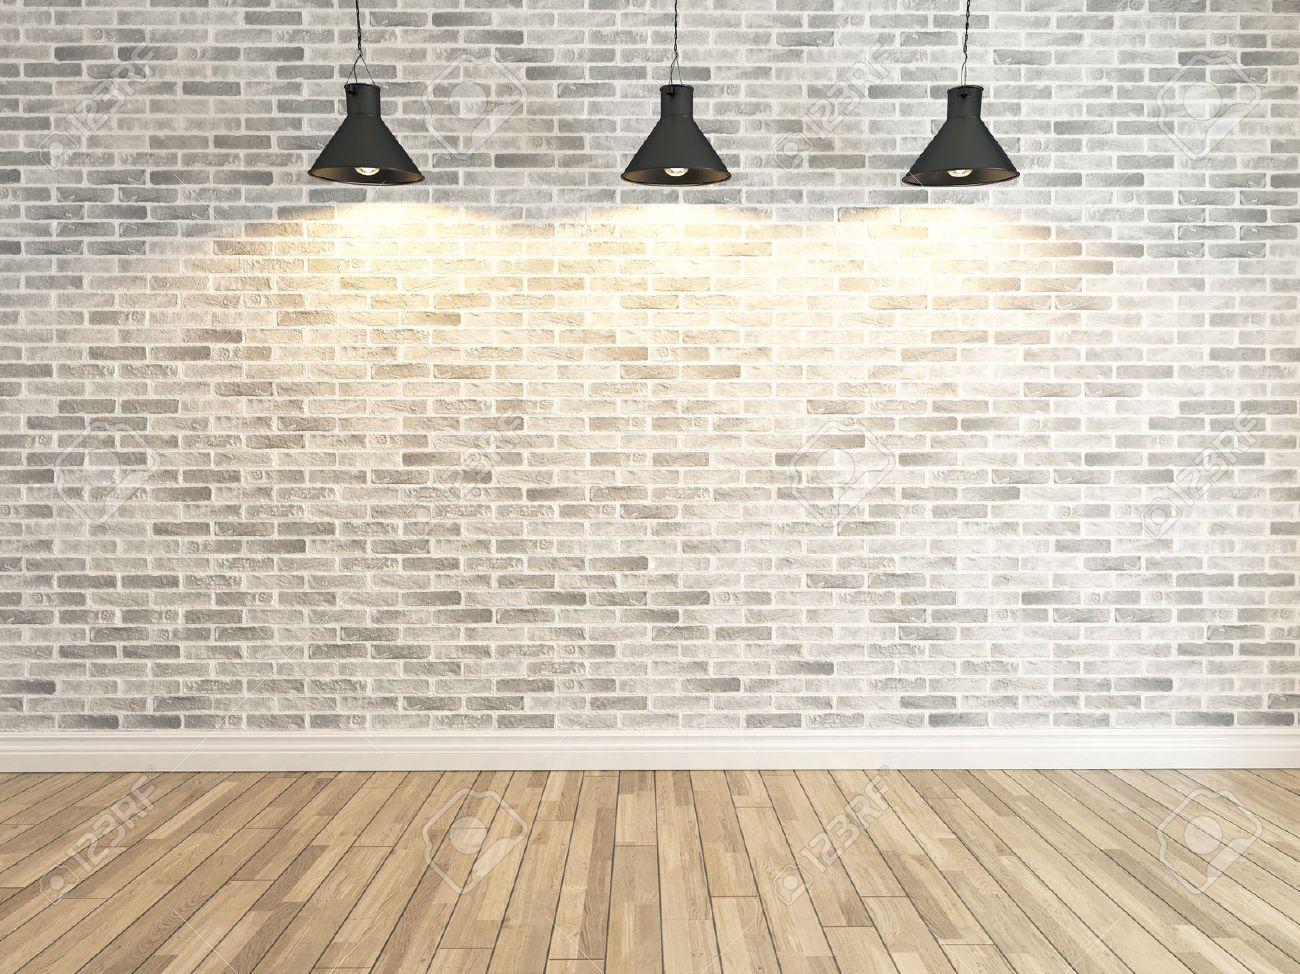 Charming Interior White Brick Wall Decoration Under Three Light, Interior Wall  Pattern And Background Stock Photo